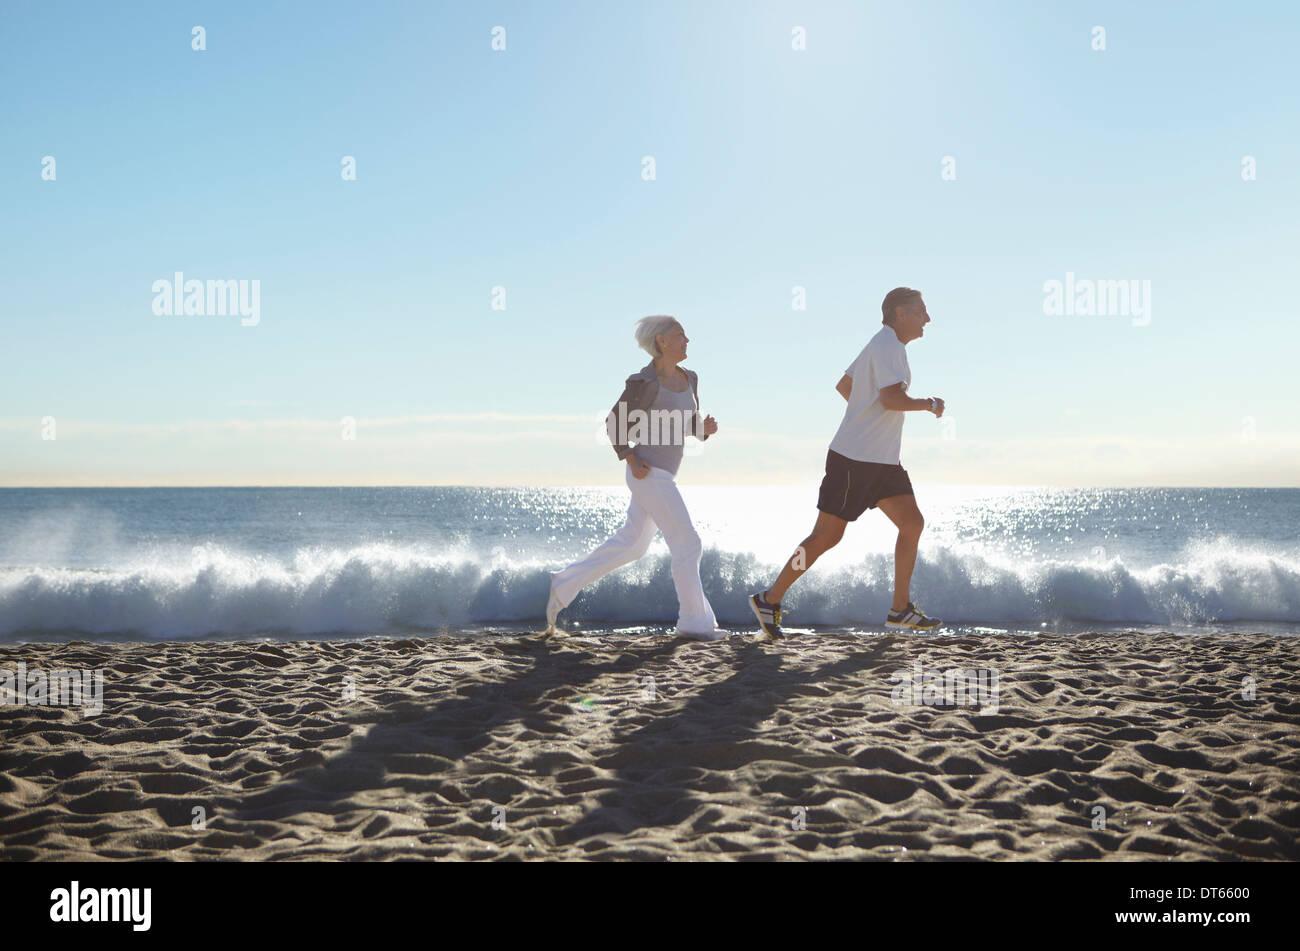 Couple jogging on beach Photo Stock